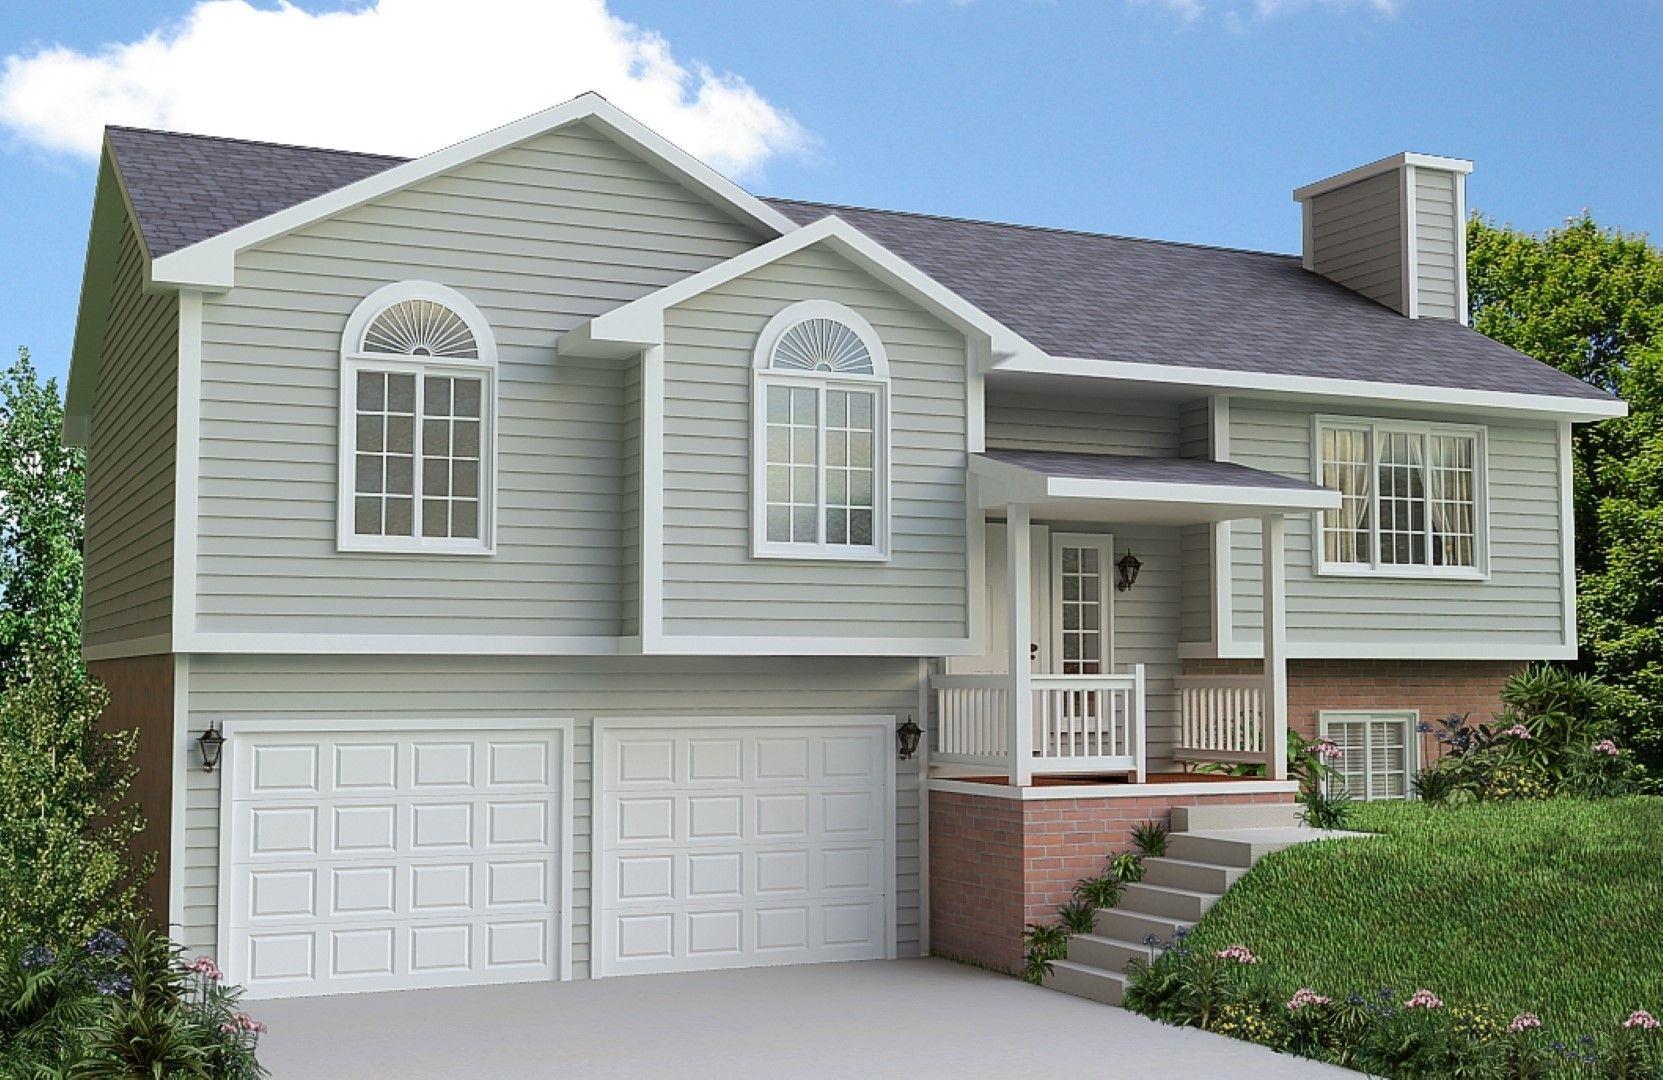 Home Plans - Homestead Homes